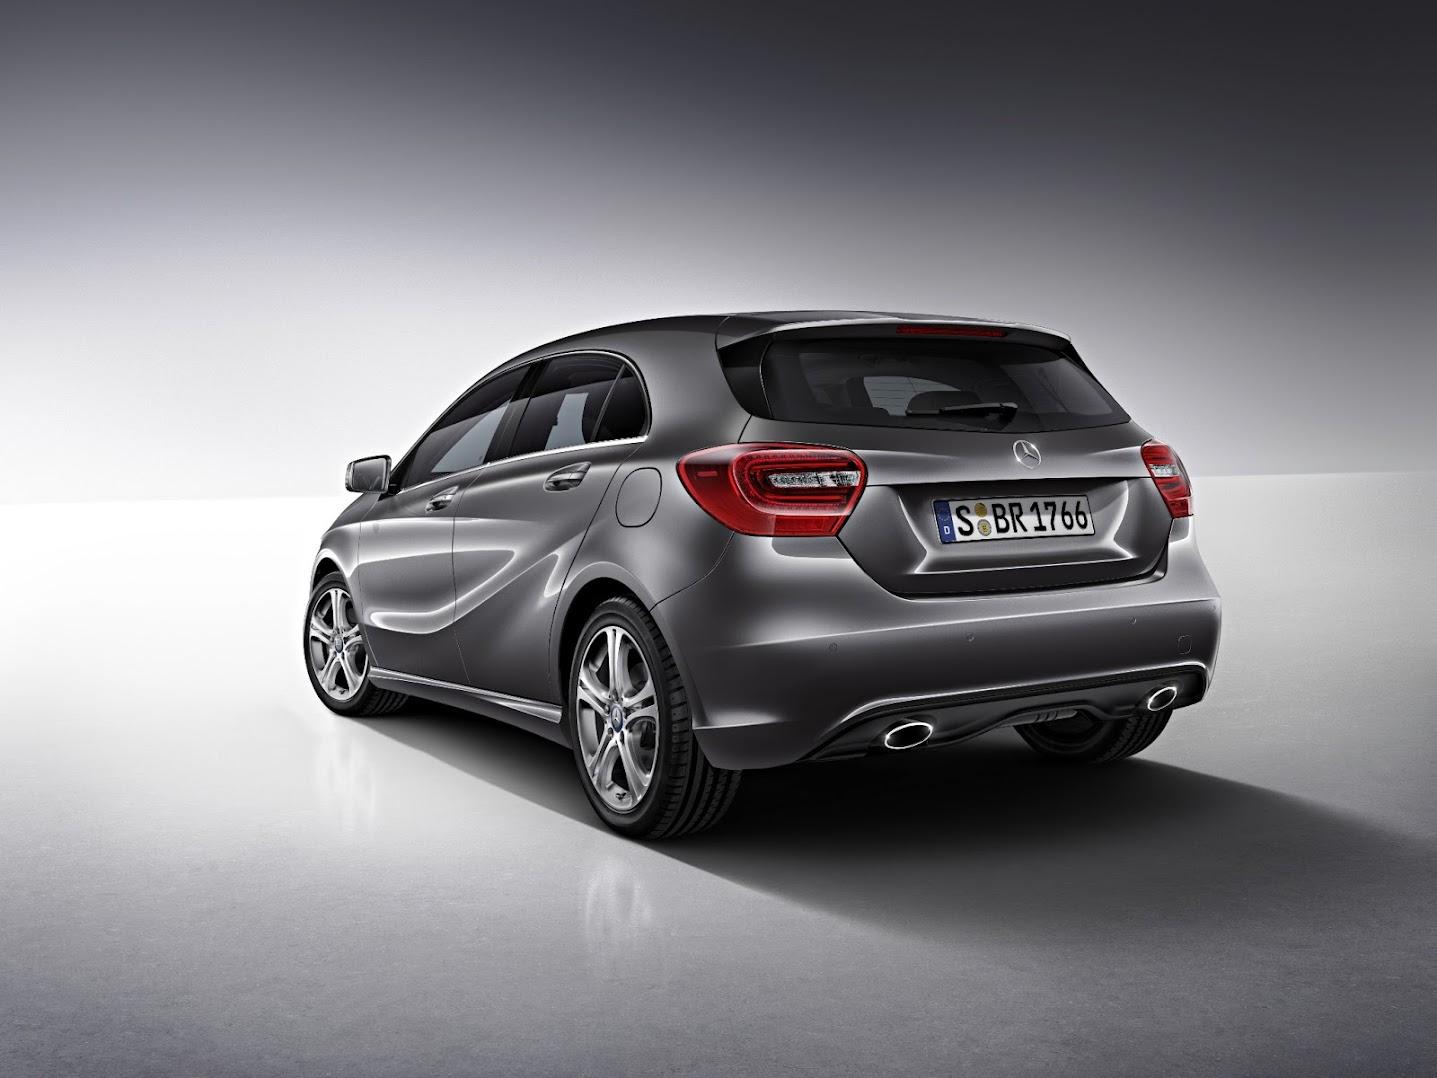 *Mercedes-Benz The new A-Class 跟著蔡依林搭載小鋼砲新血來襲:「PROJECT A+」萬人電音派對! 10